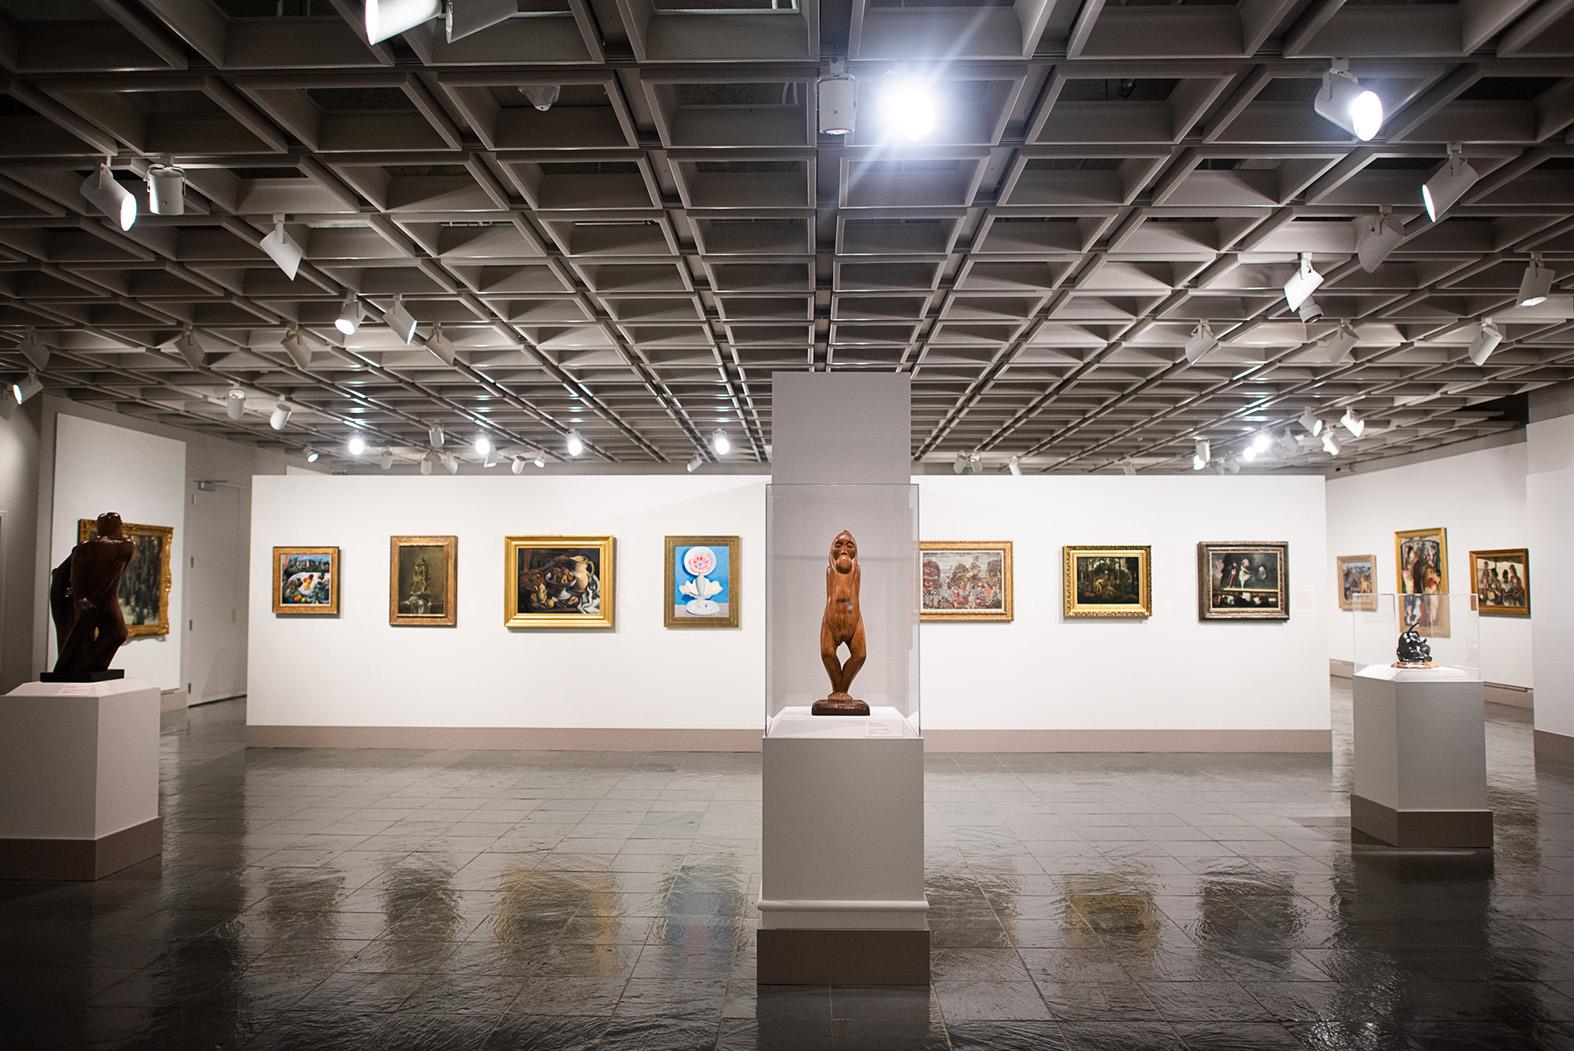 Hull Gallery